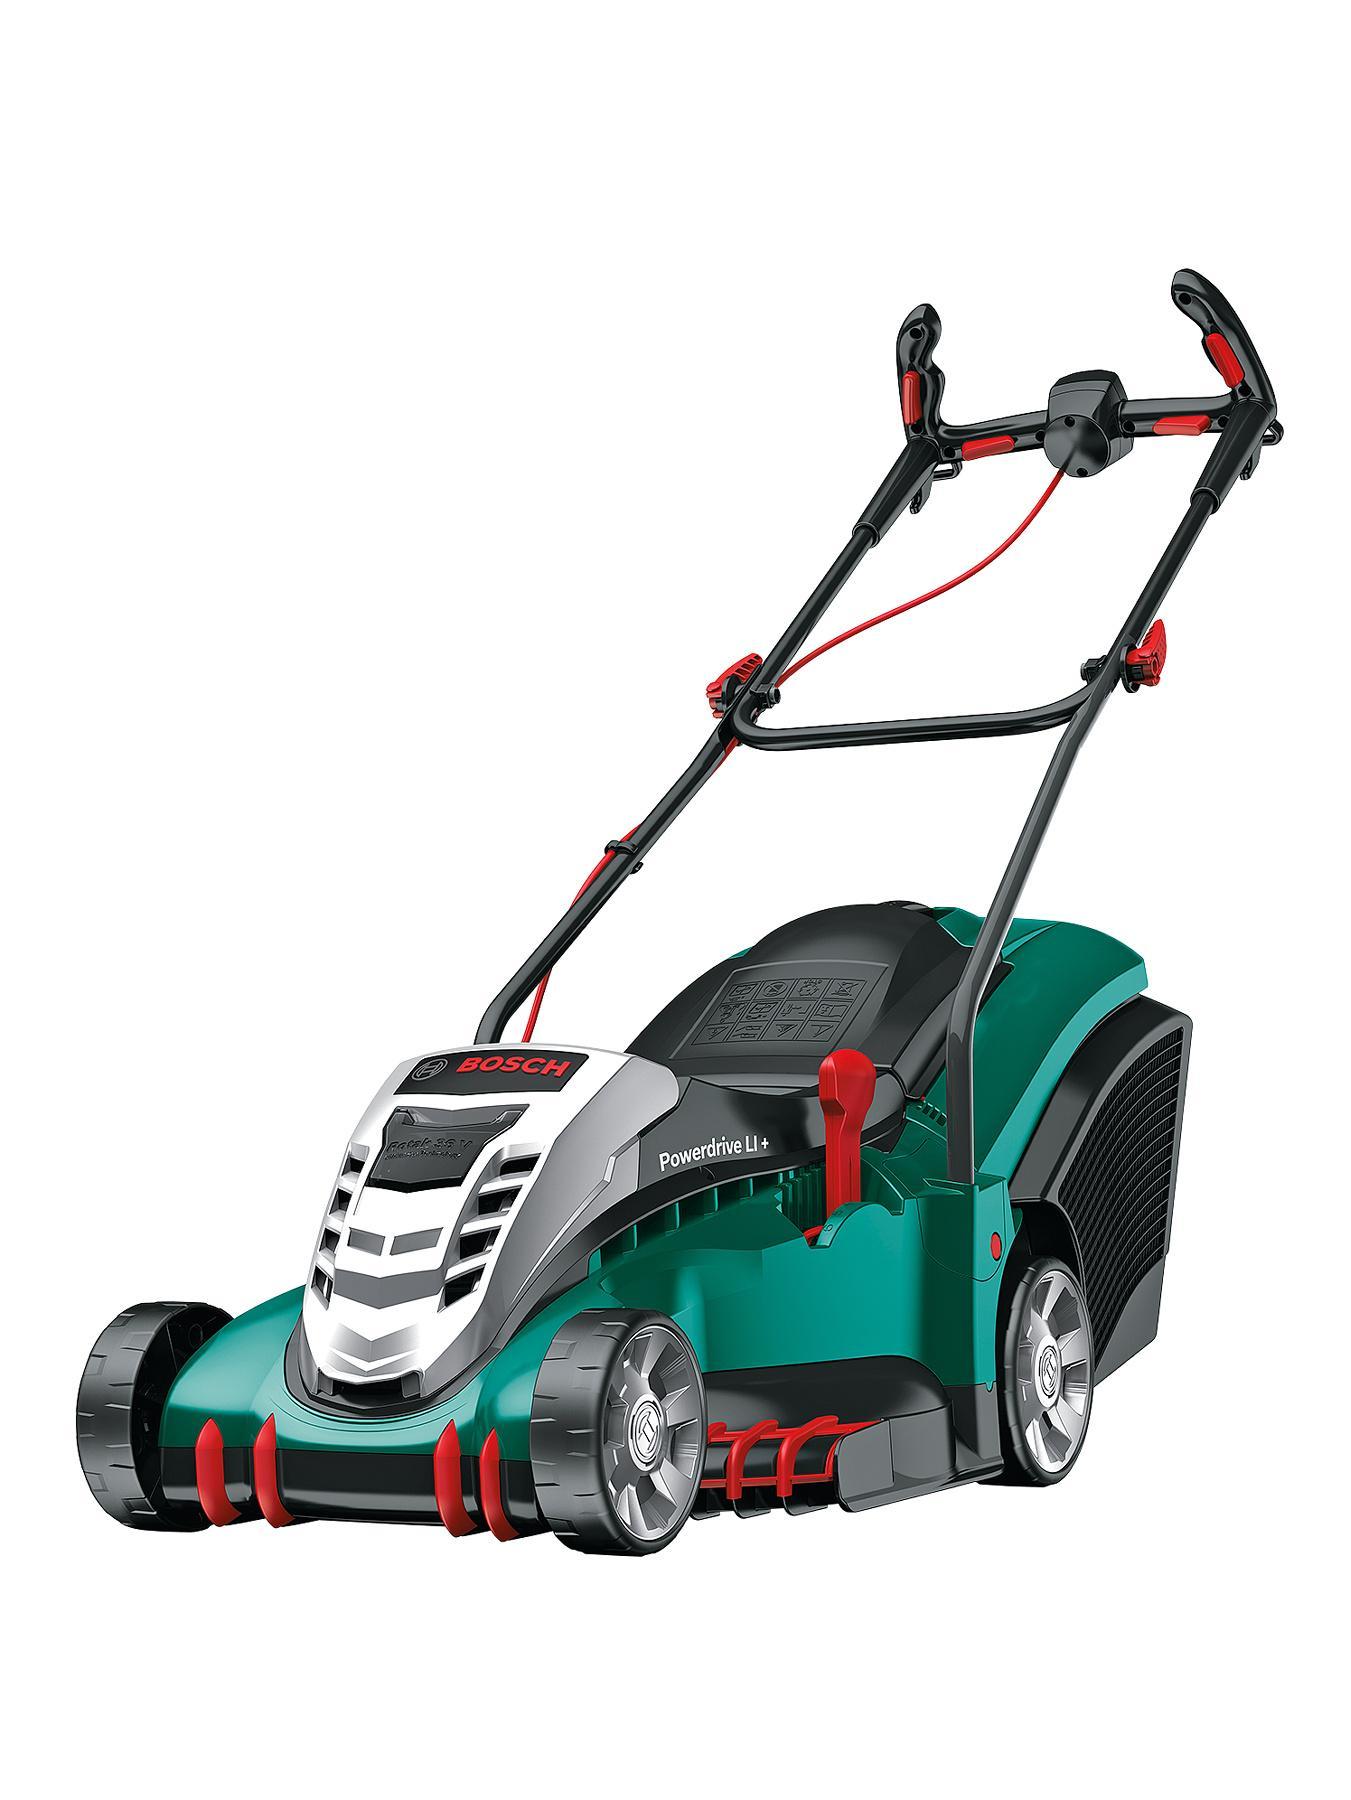 Bosch 43LI Lithium ION Cordless Ergoflex Rotary Lawn Mower